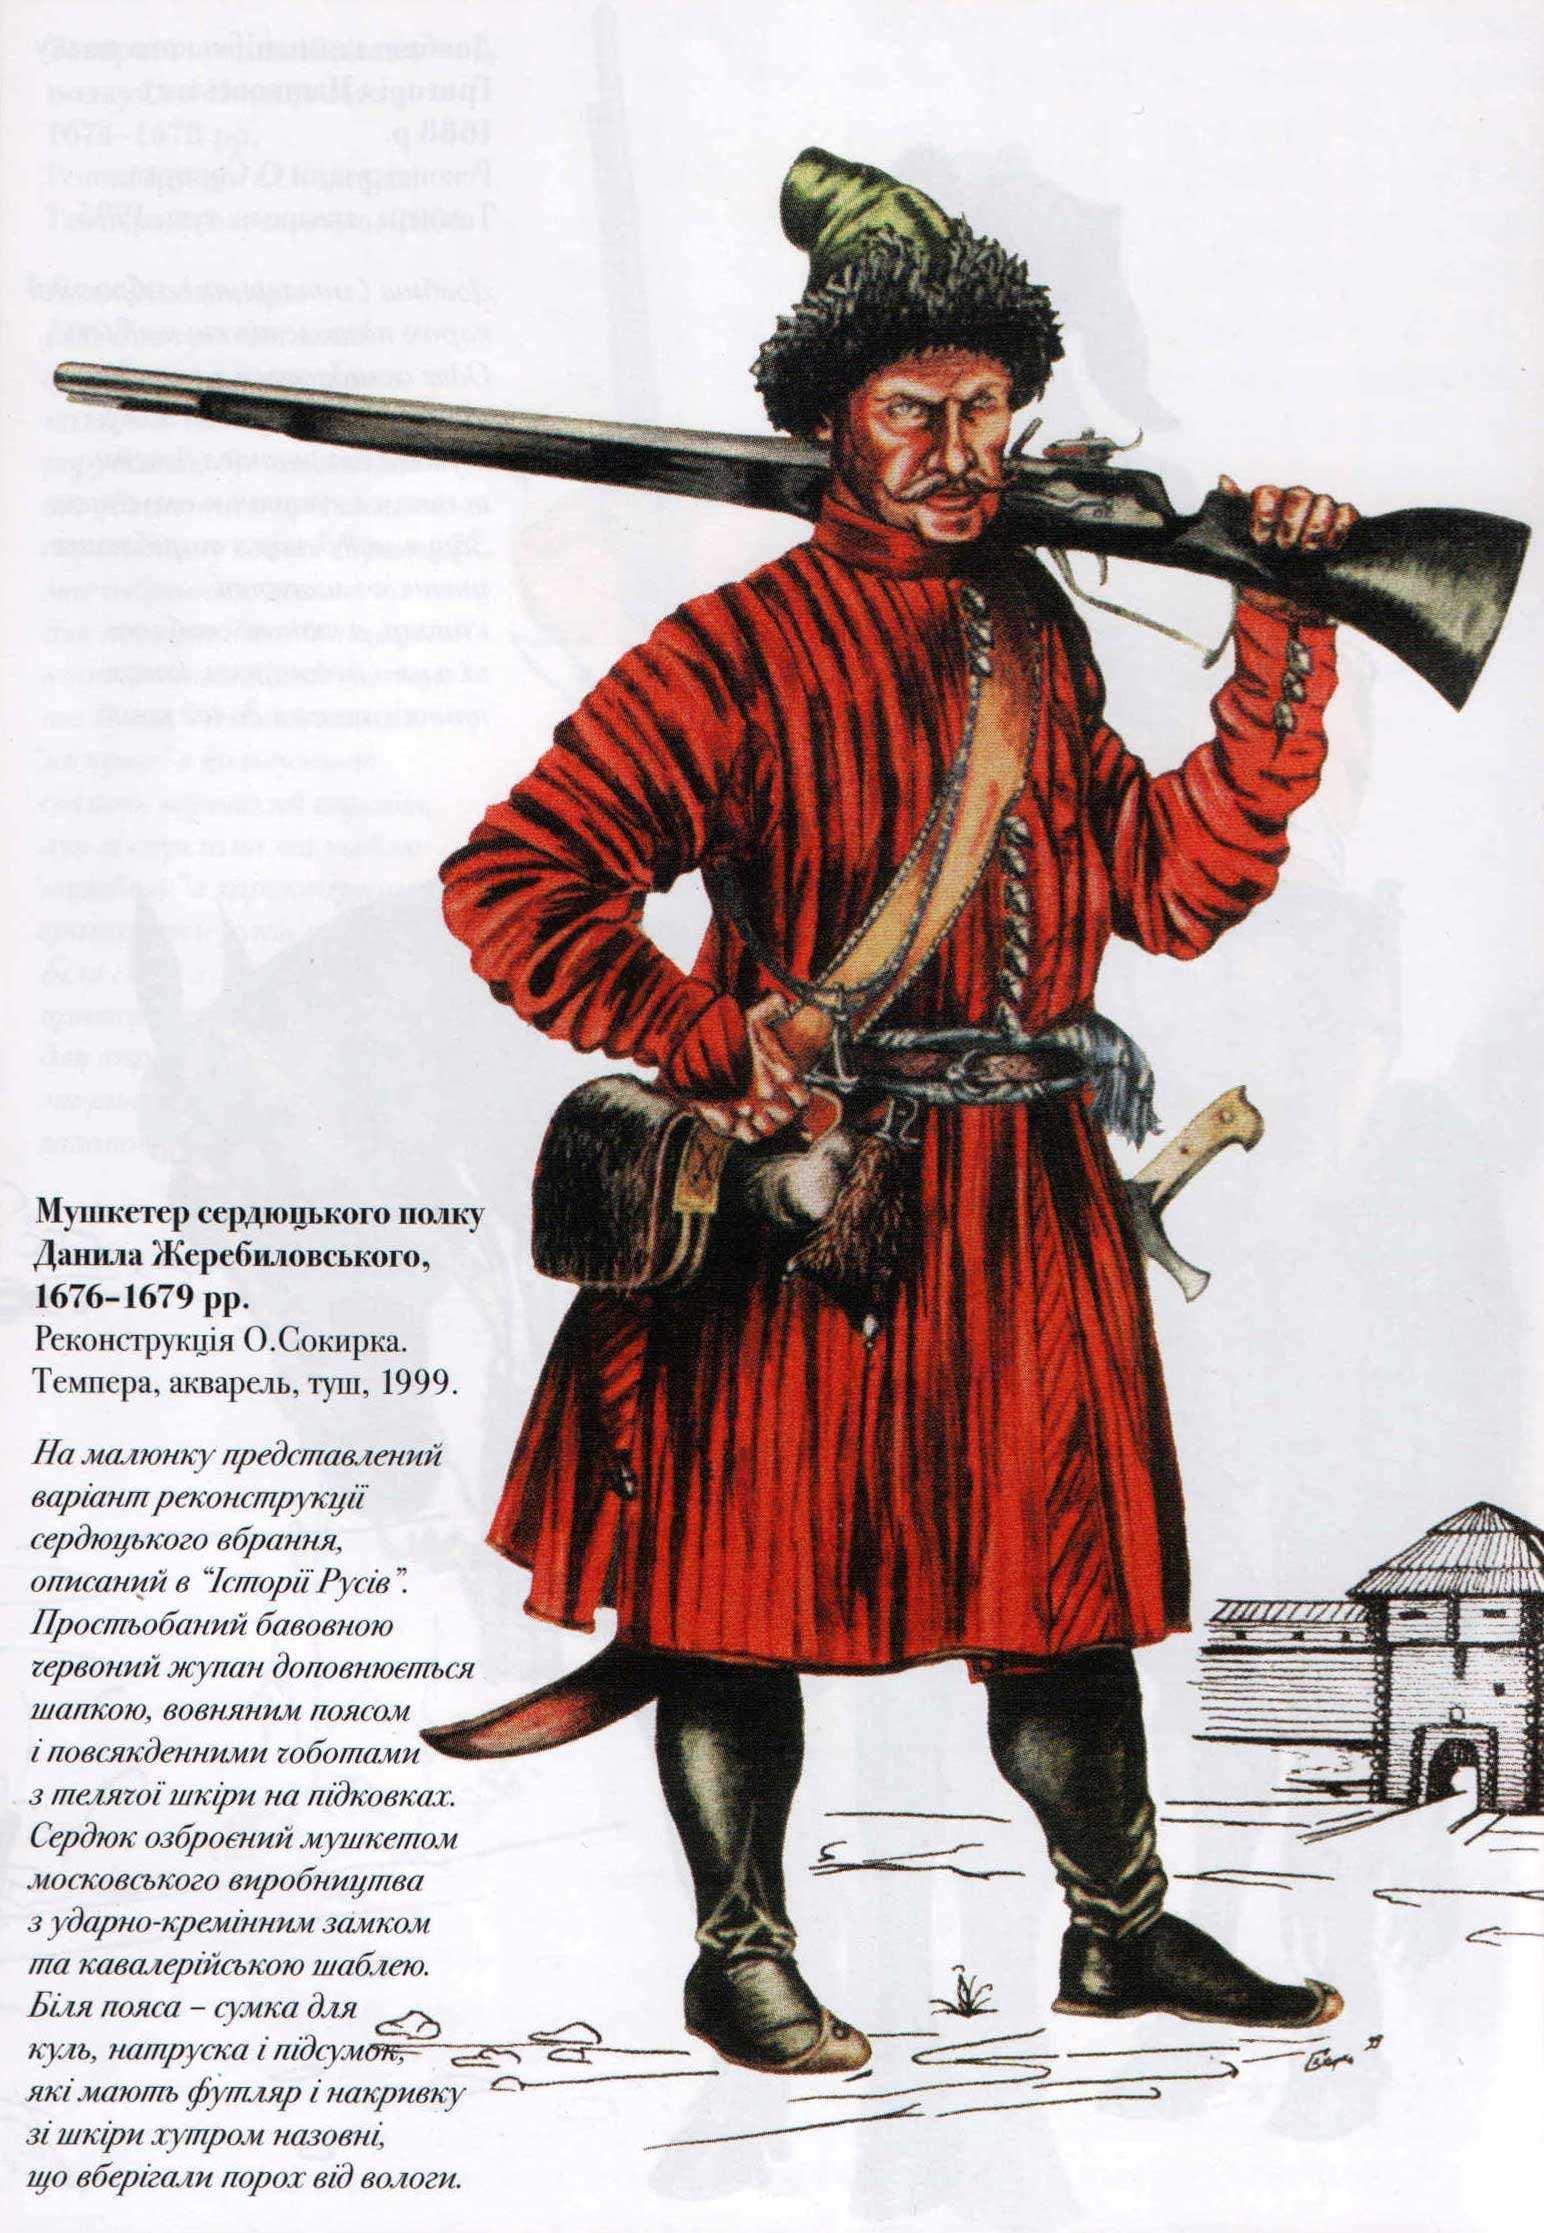 Мушкетер сердюцького полку Данила Жеребиловського